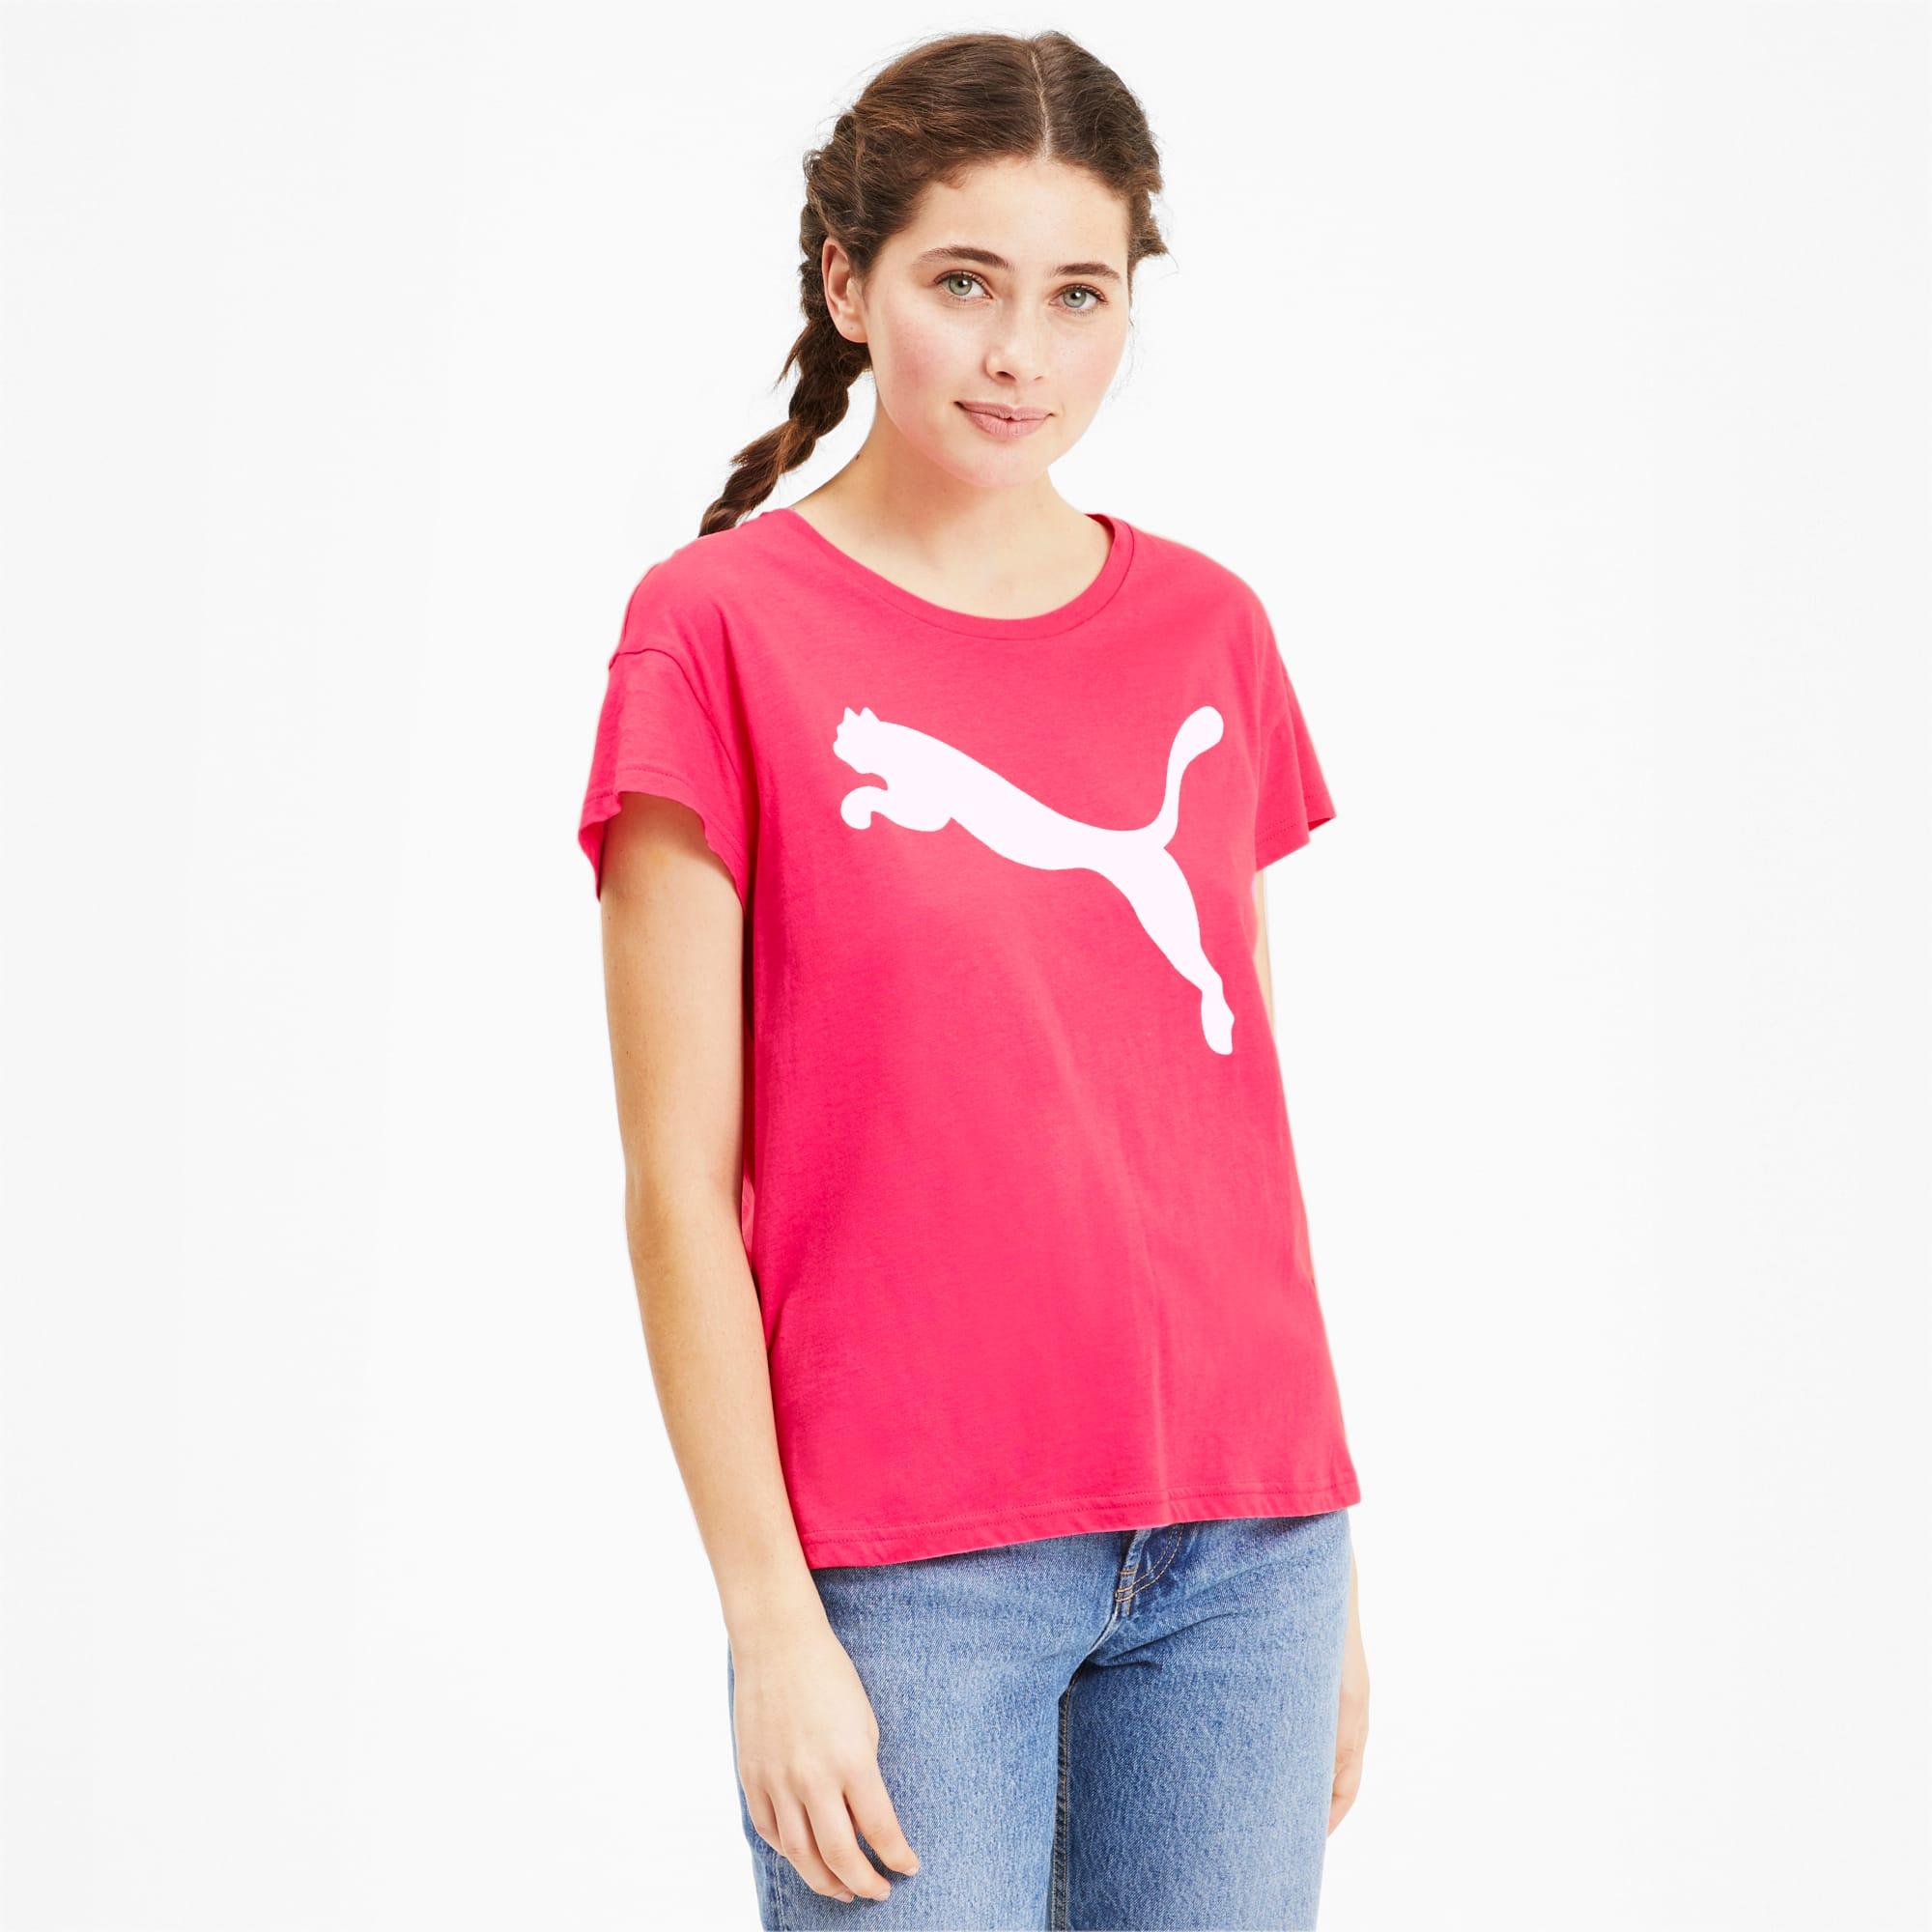 puma -  Active Damen T-Shirt | Rosa | Größe: L